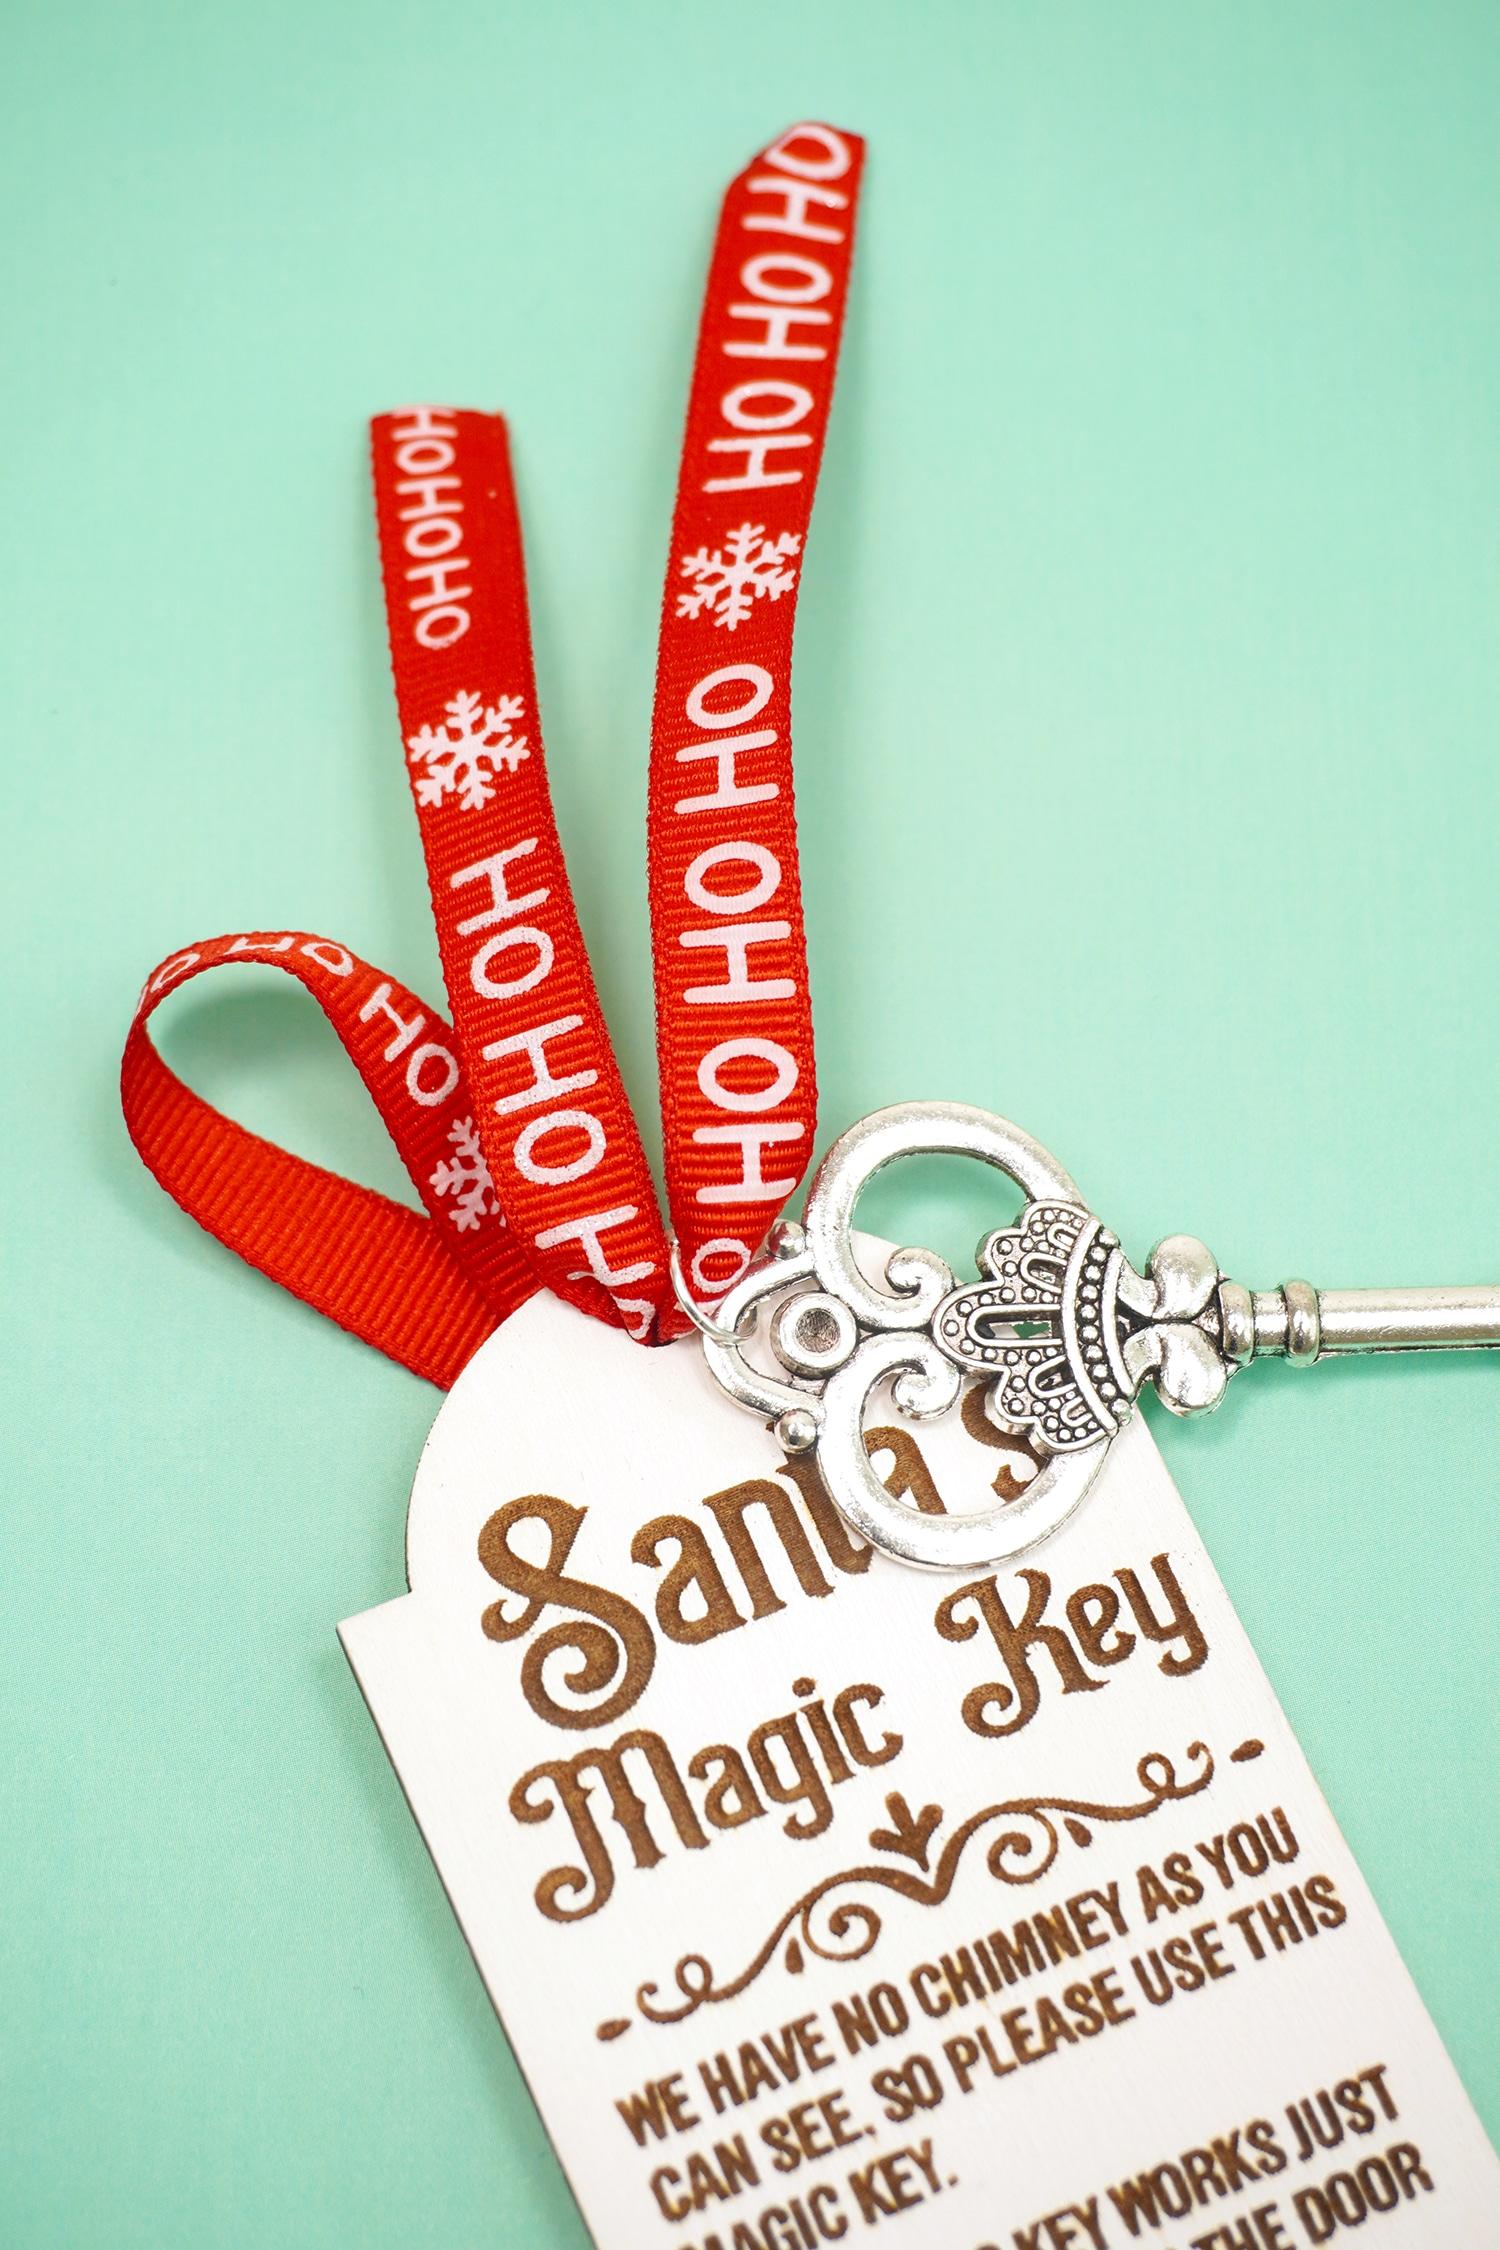 Adding a red ribbon and silver key to a laser engraved Santa's Magic Key tag